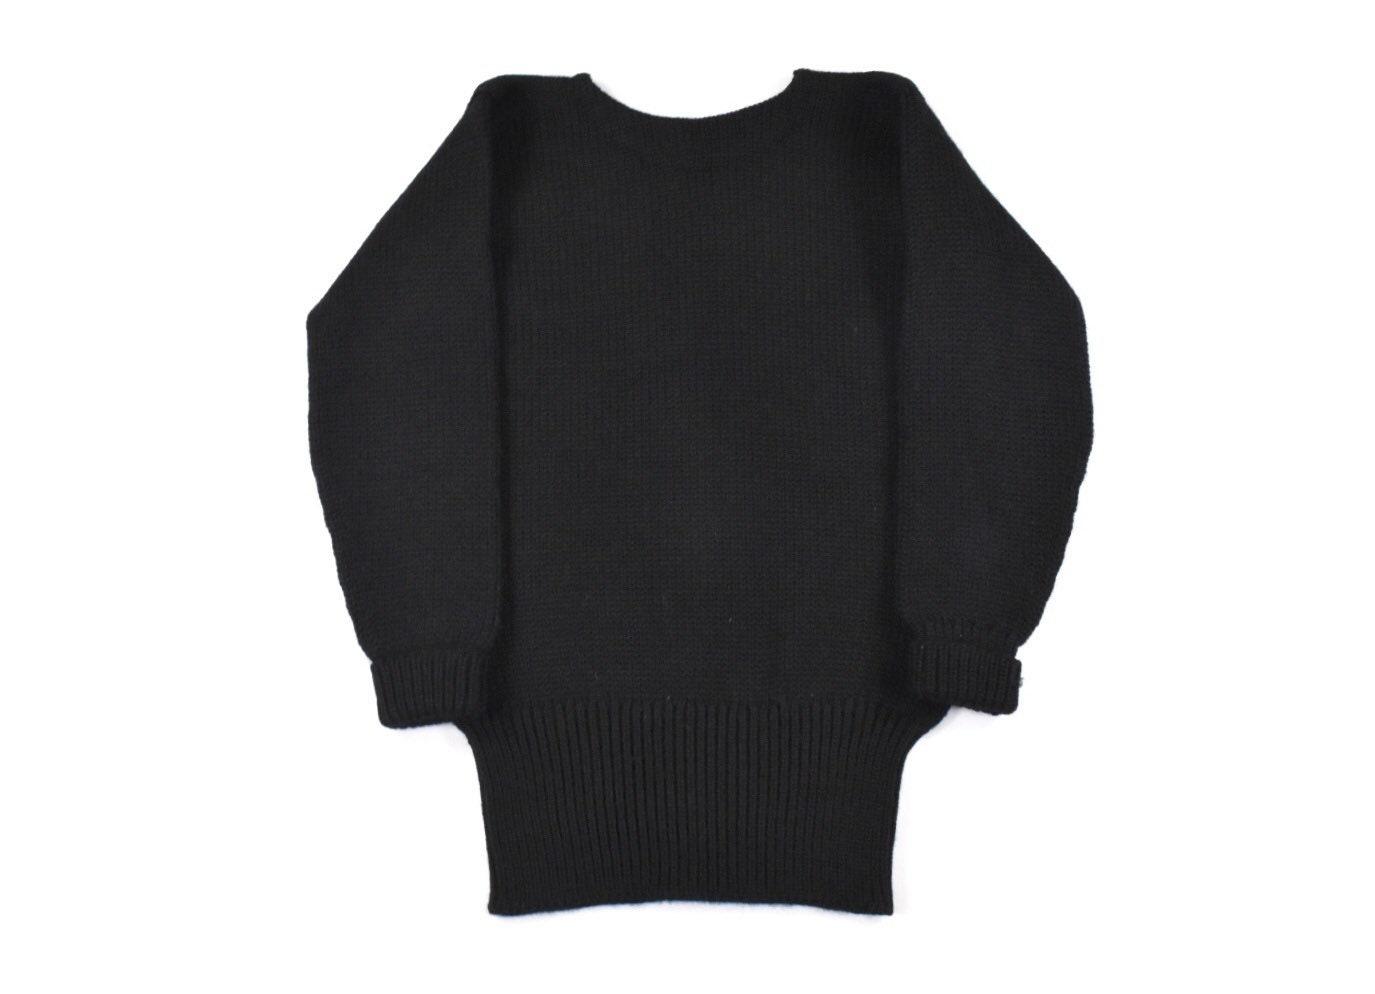 New 1930s Mens Fashion Ties 1930S Small Varsity Sweater Knit Black Wool Boat Neck Mens Vintage Jumper Sportswear $20.00 AT vintagedancer.com